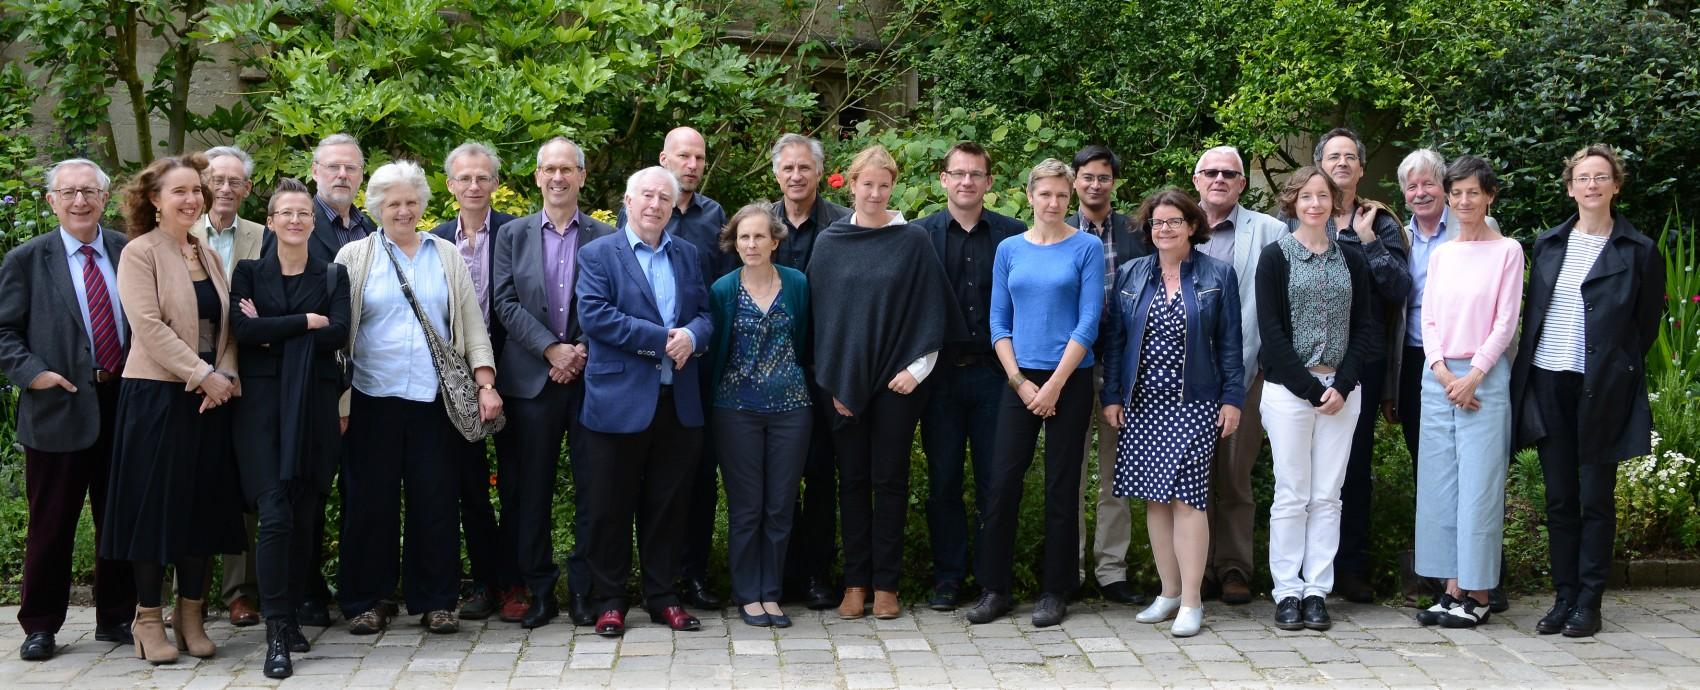 The Past&Present Editorial Board